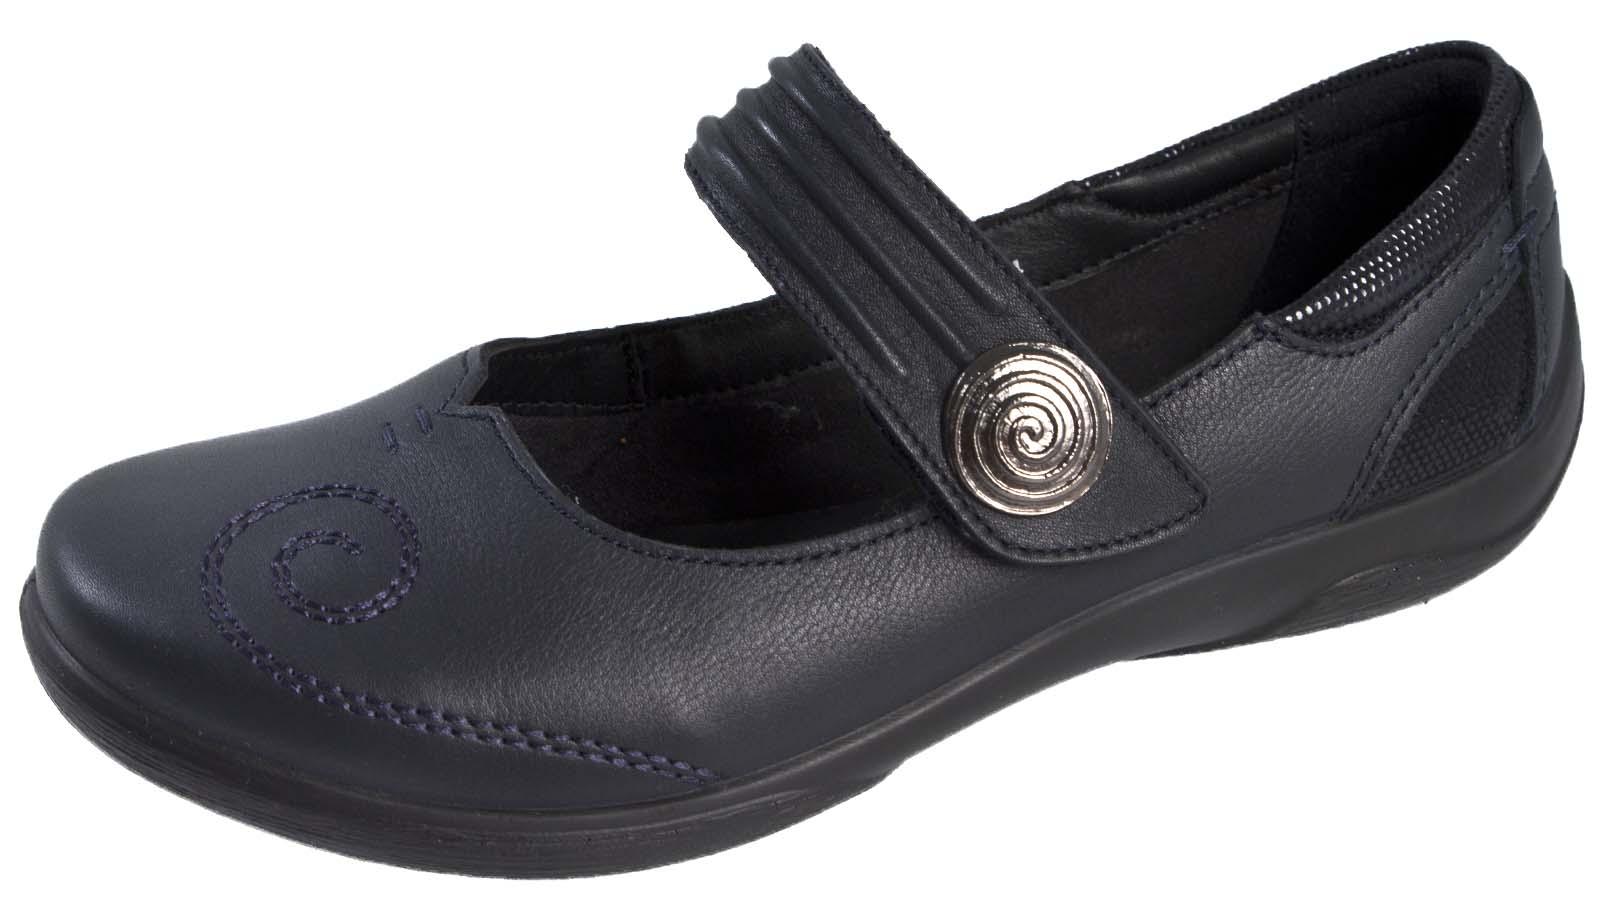 Padders Walking Shoes